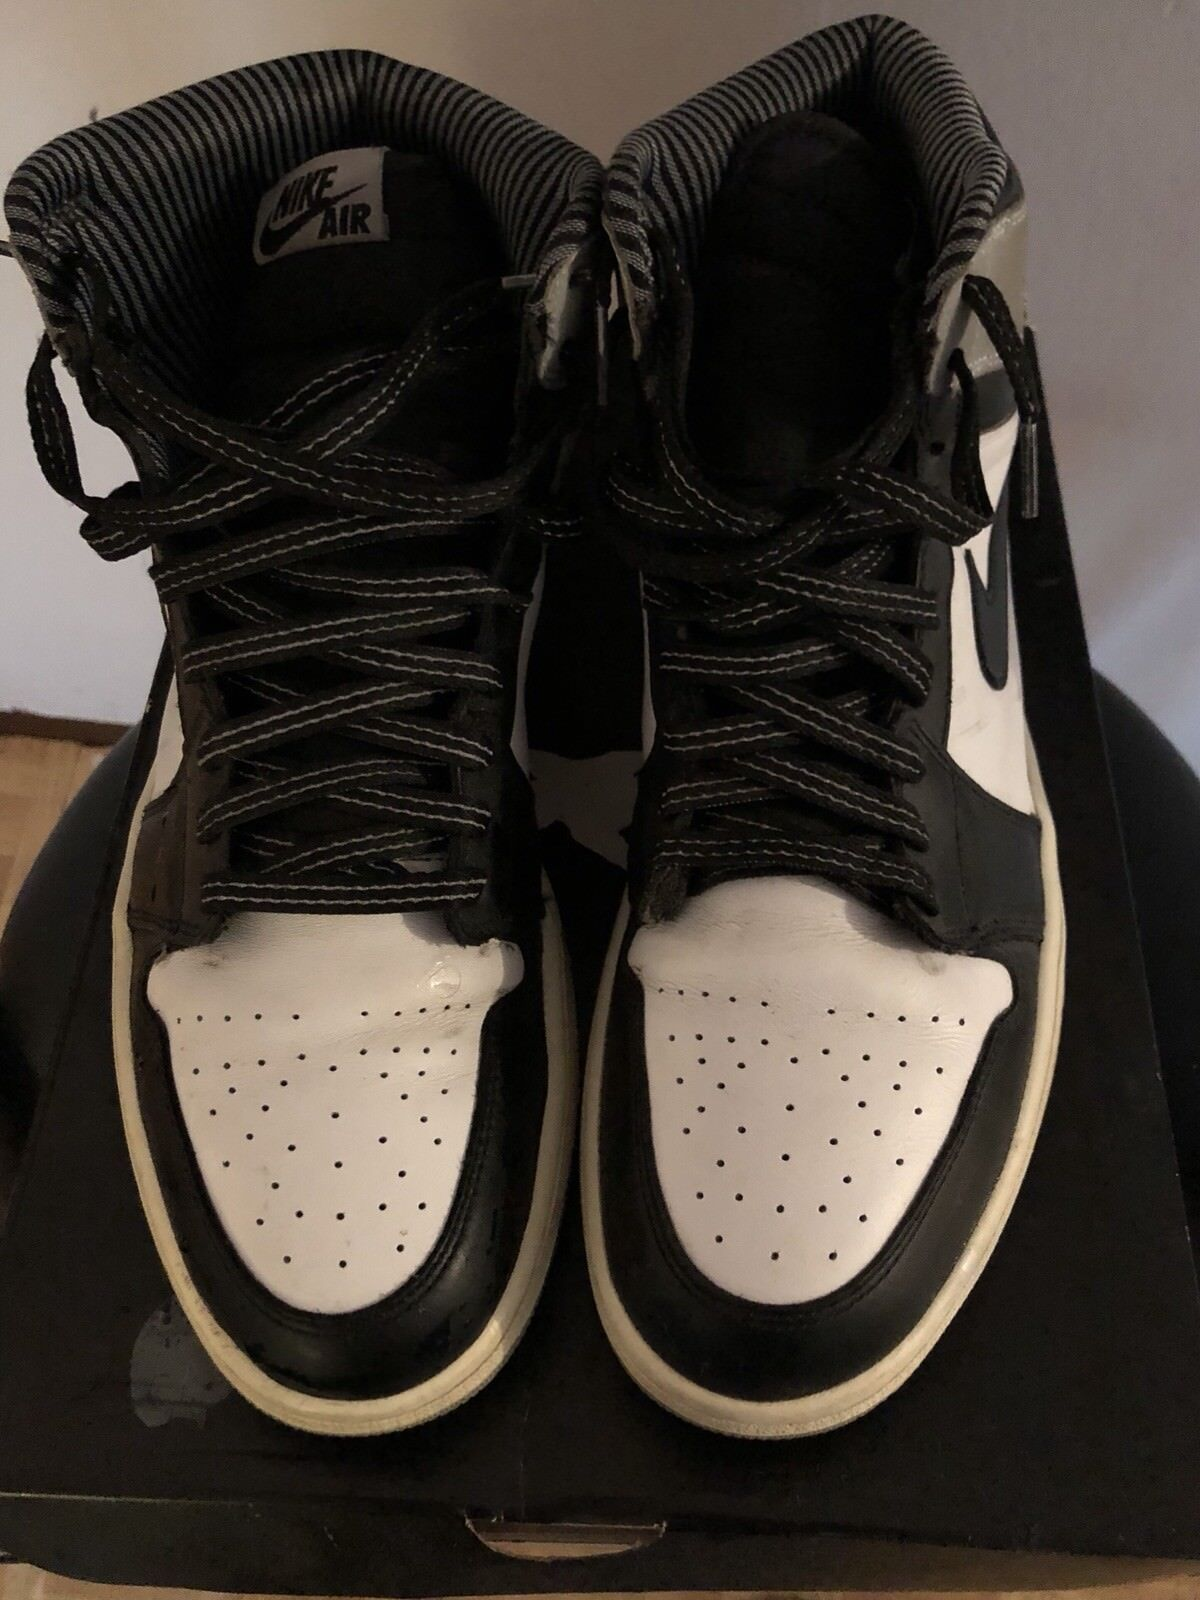 Jordan. Lookable Lookable Jordan. und unverwechselbare Schuhe 594e4b